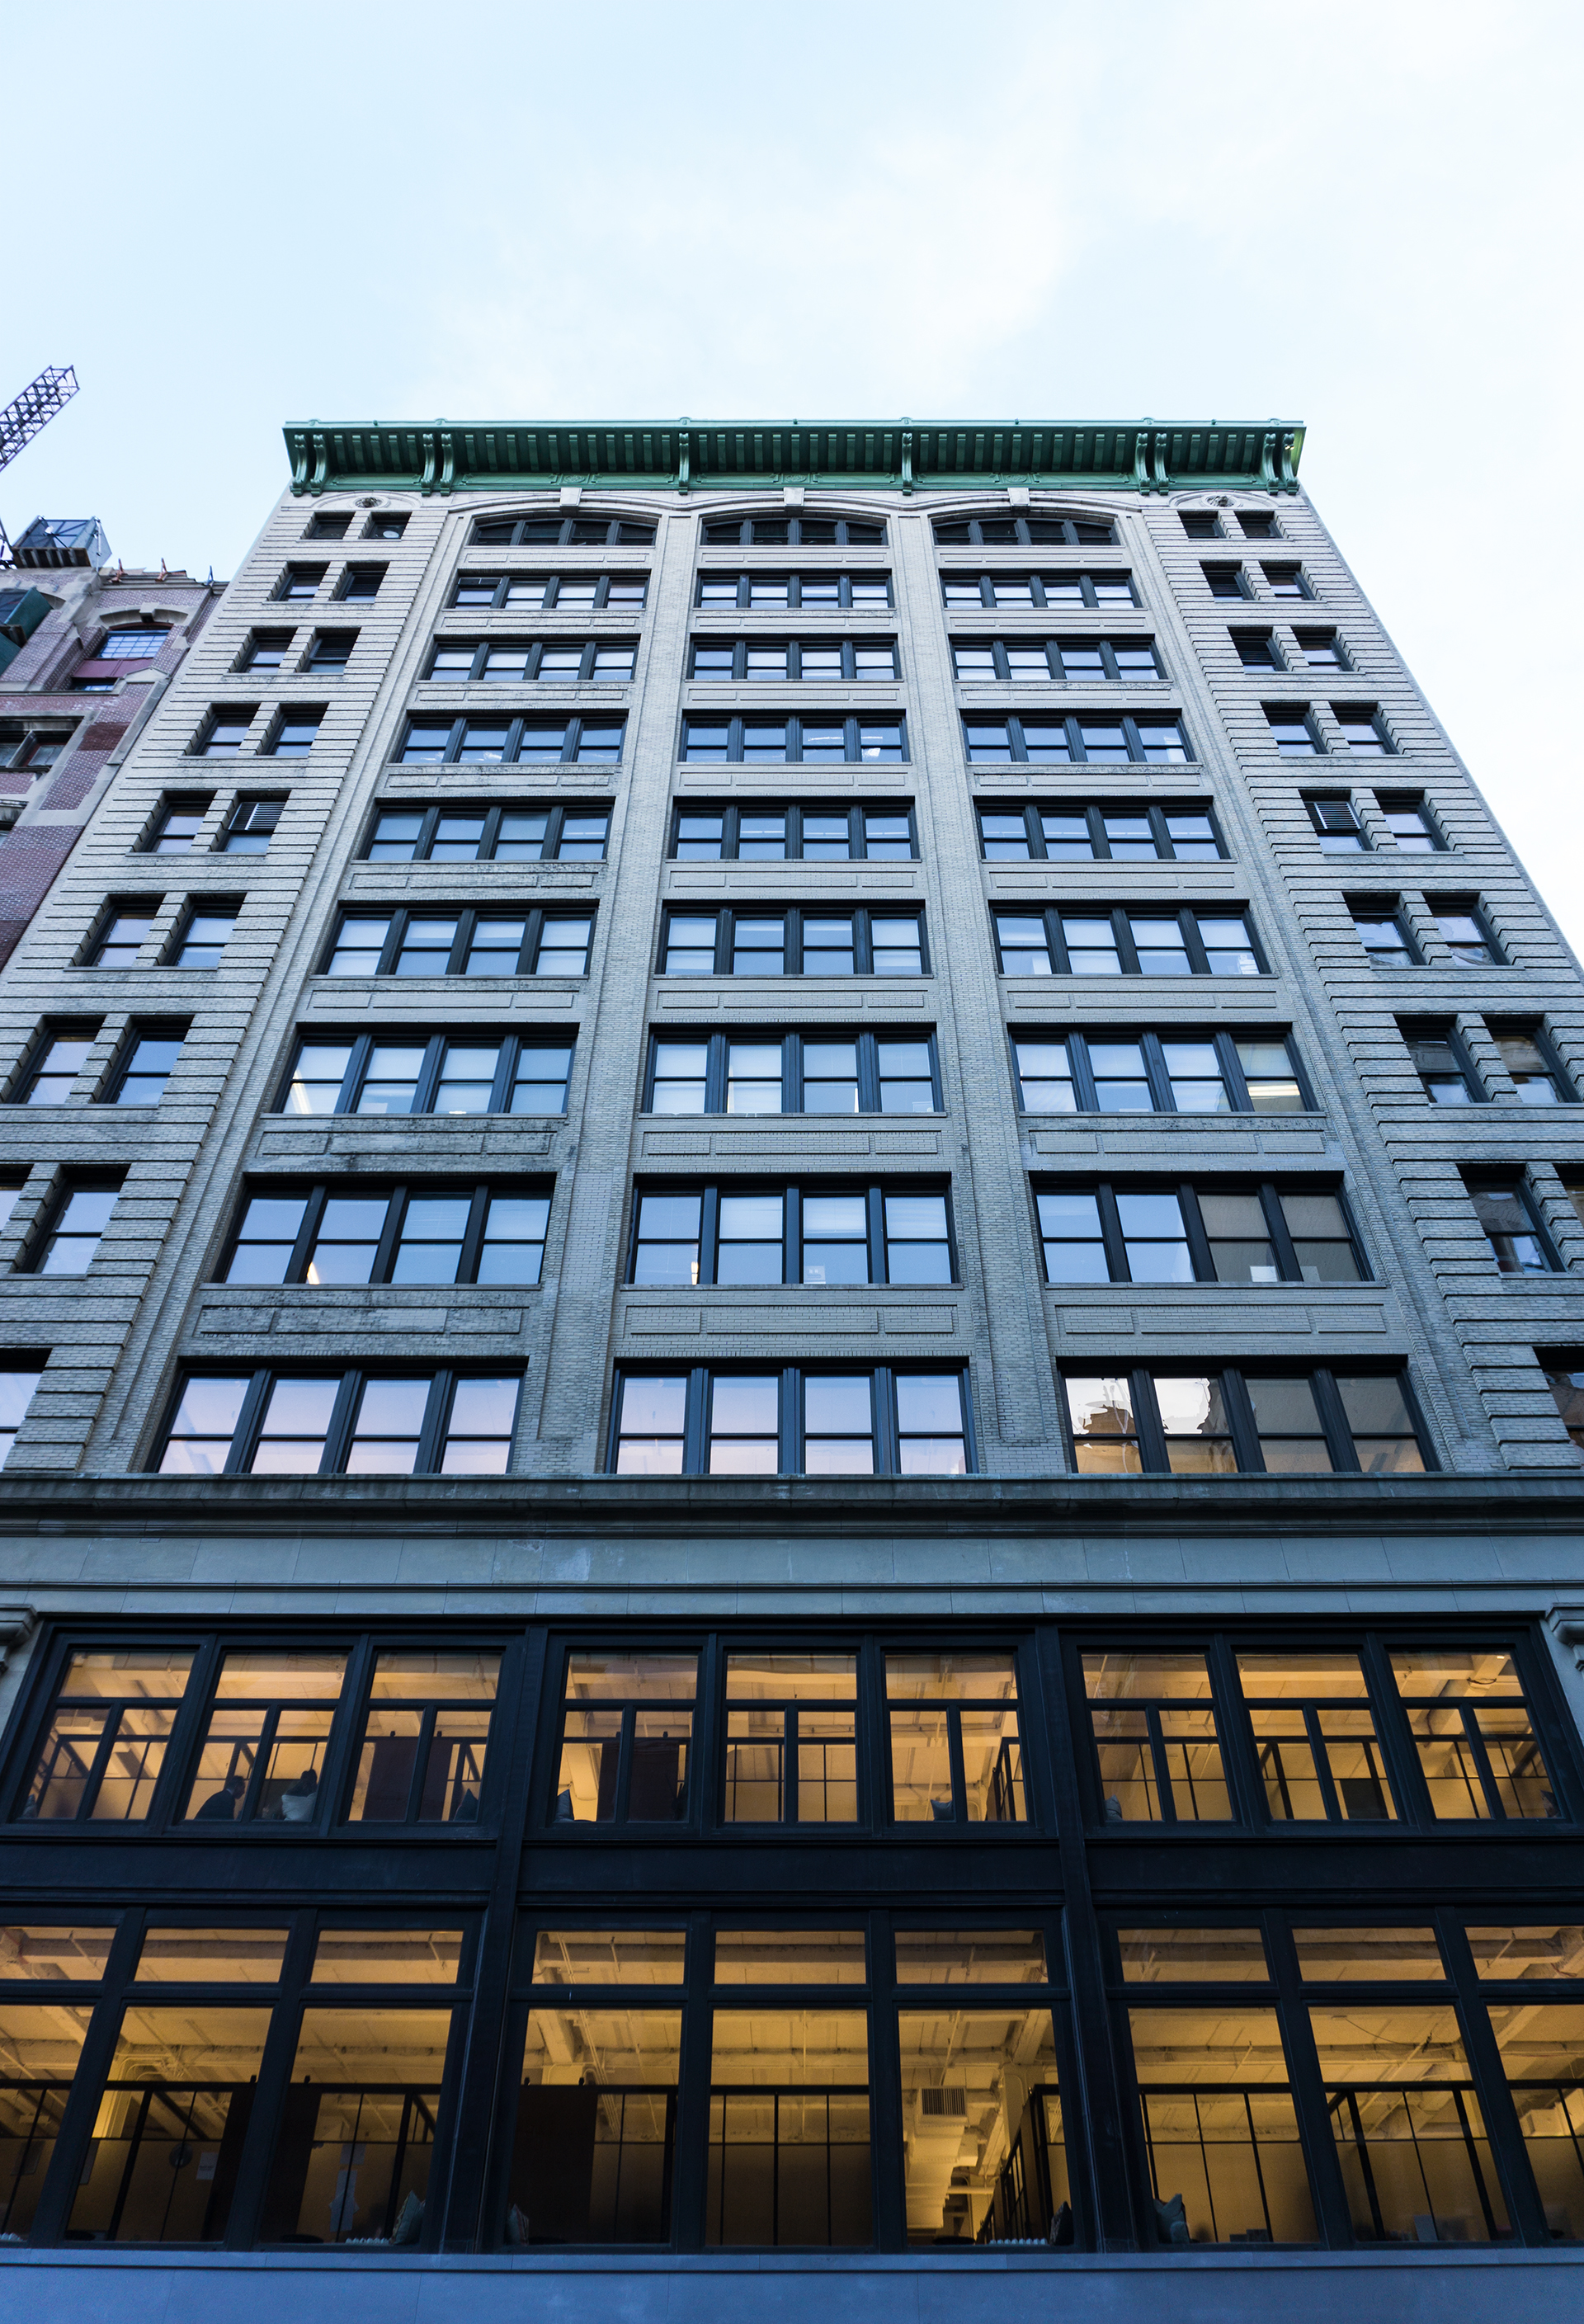 104 east 25th street -